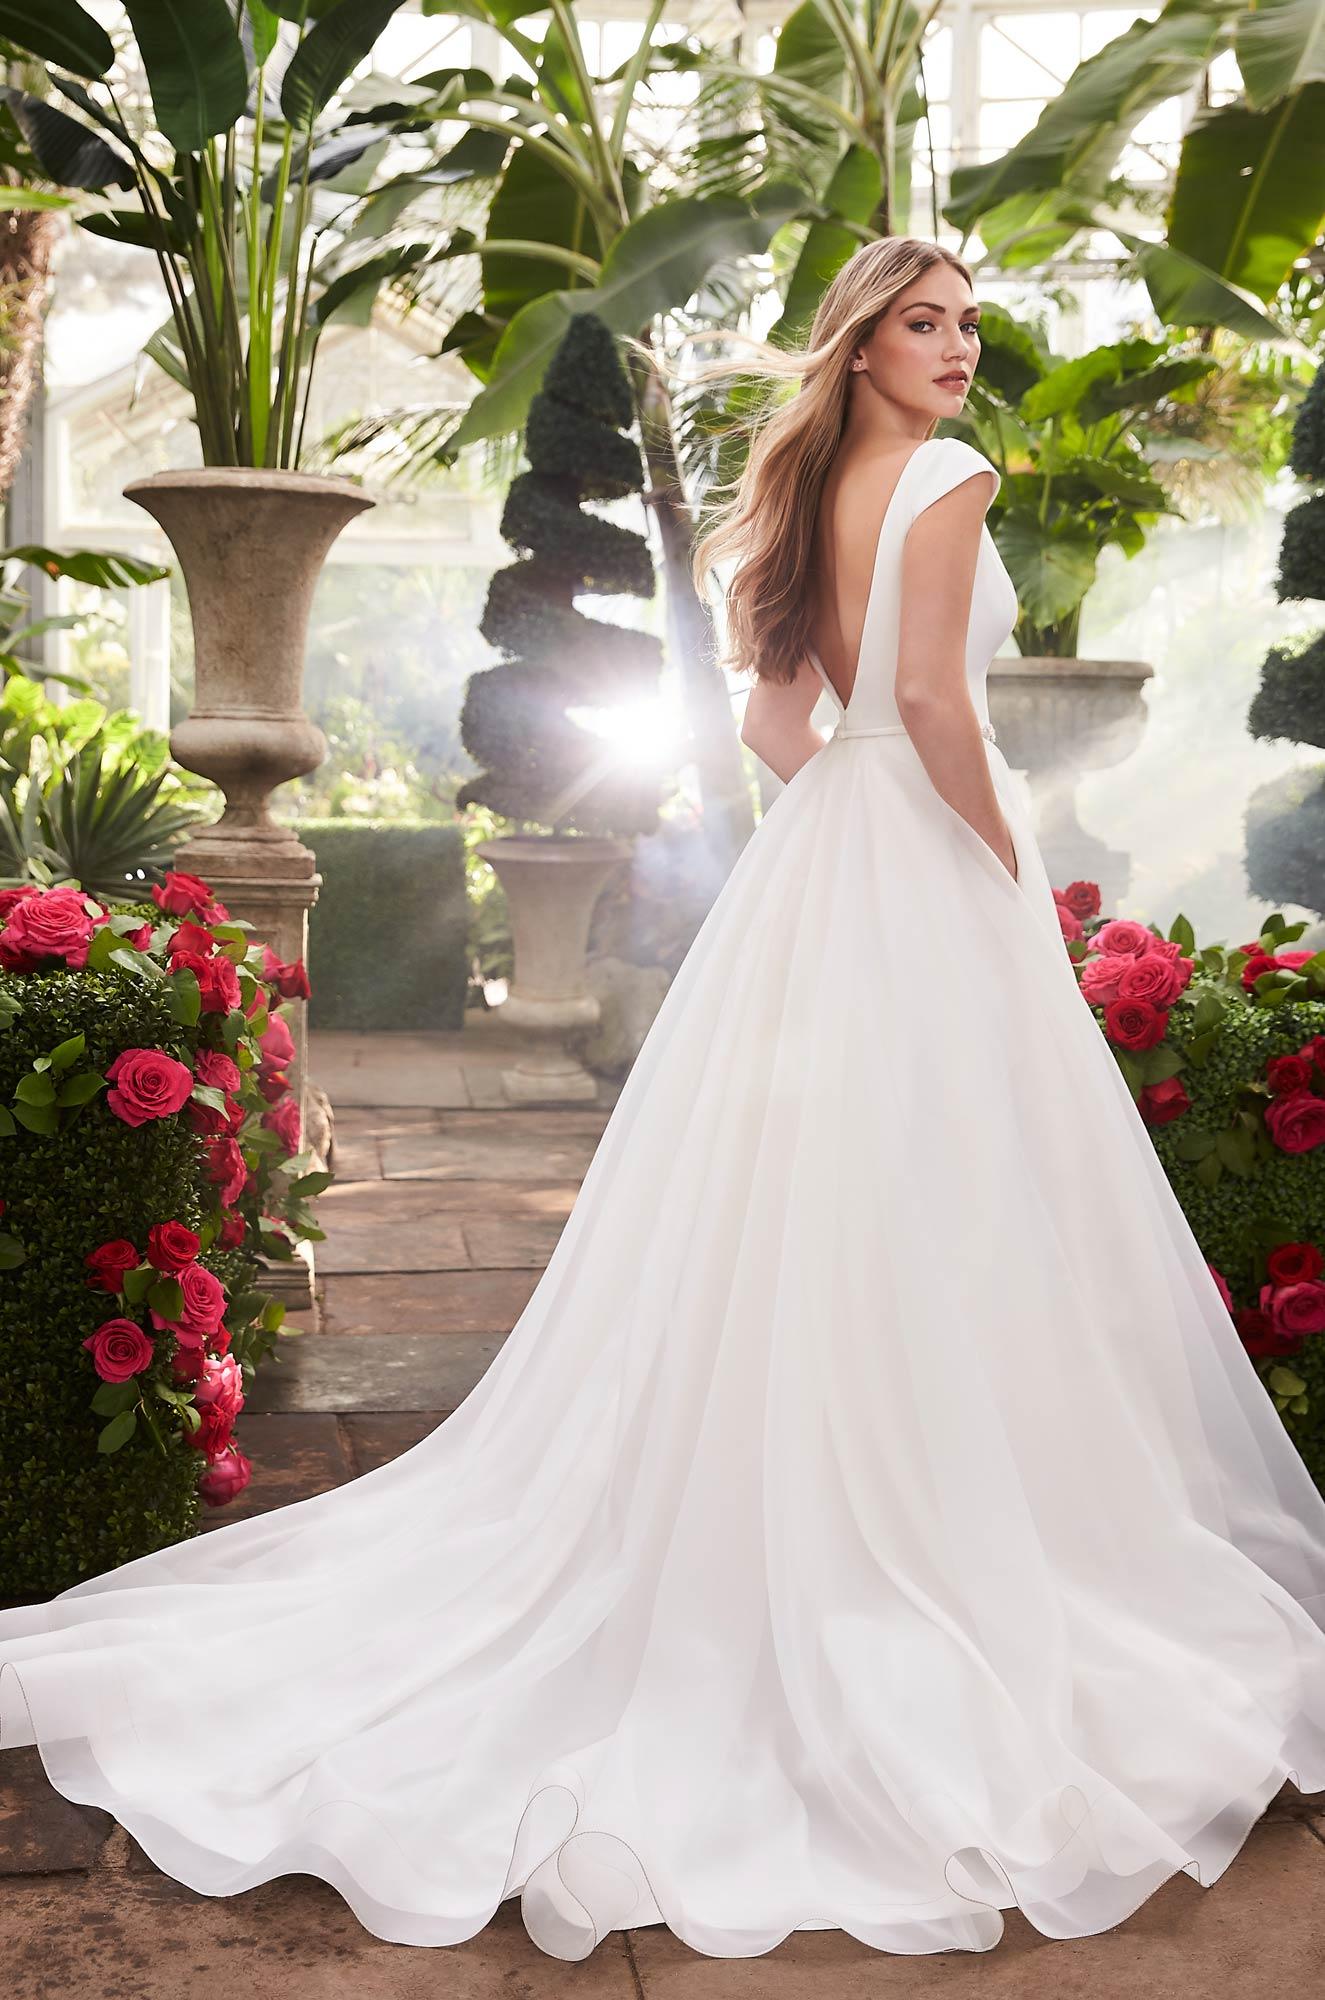 Breathtaking Cap Sleeve Wedding Dress - Style #2253 | Mikaella Bridal